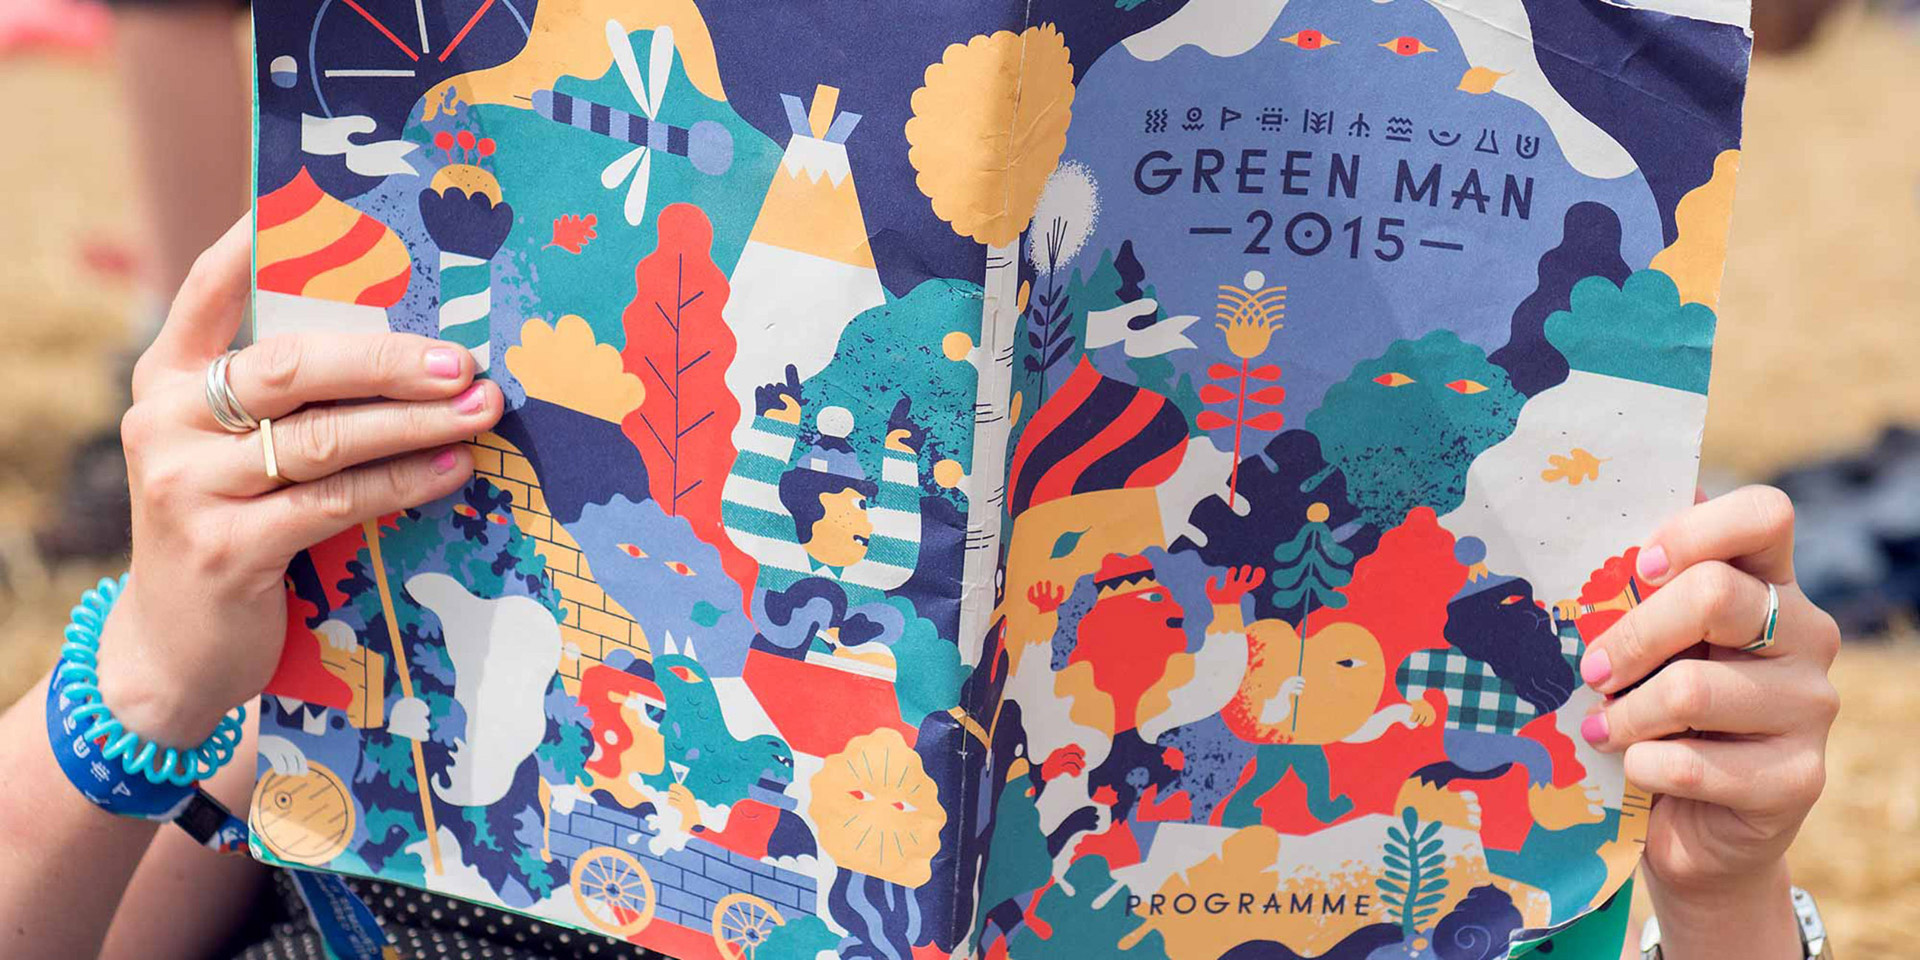 Hedof_Green Man_Image_14.jpg